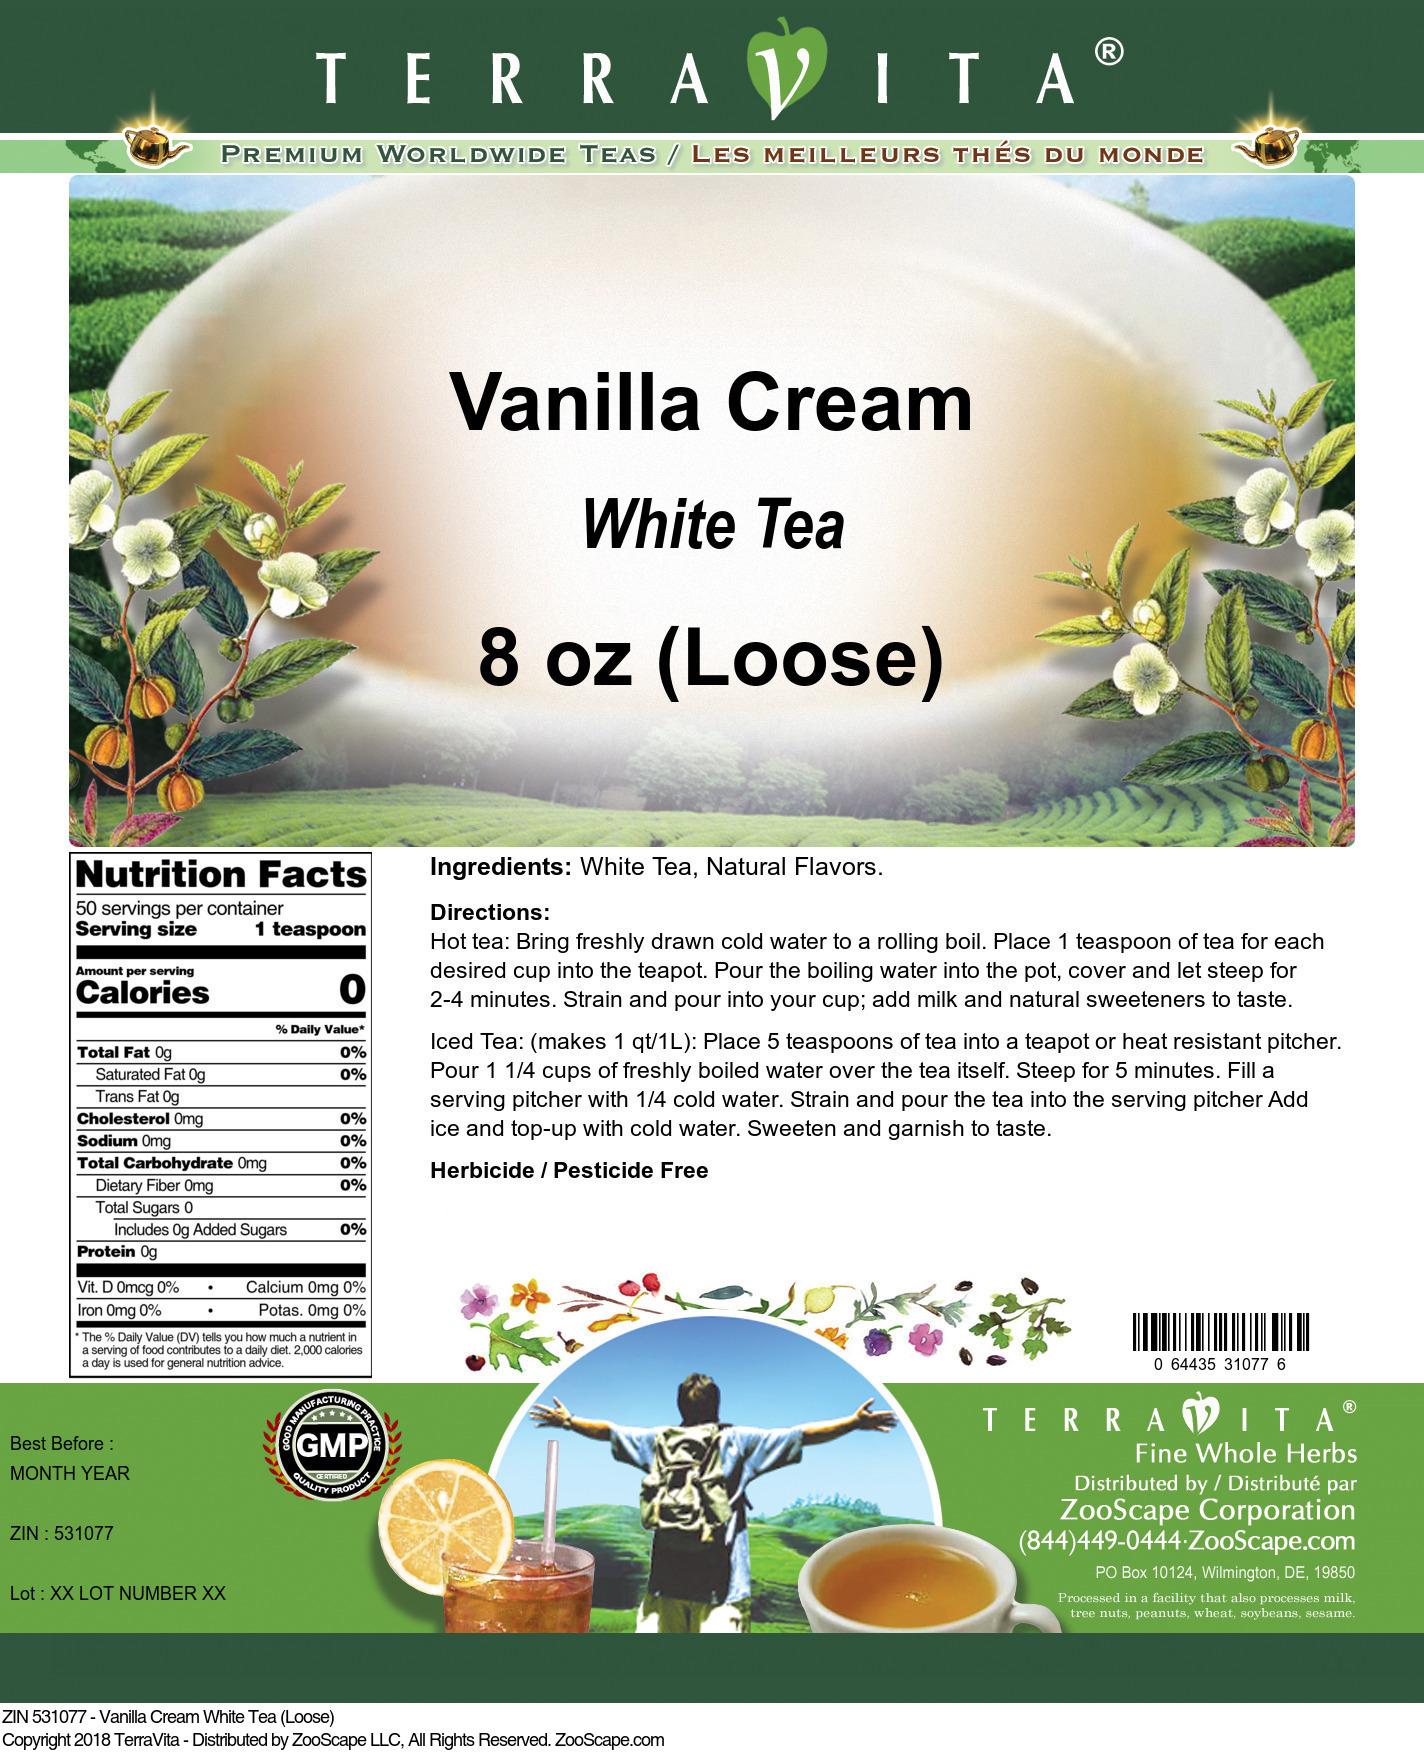 Vanilla Cream White Tea (Loose)